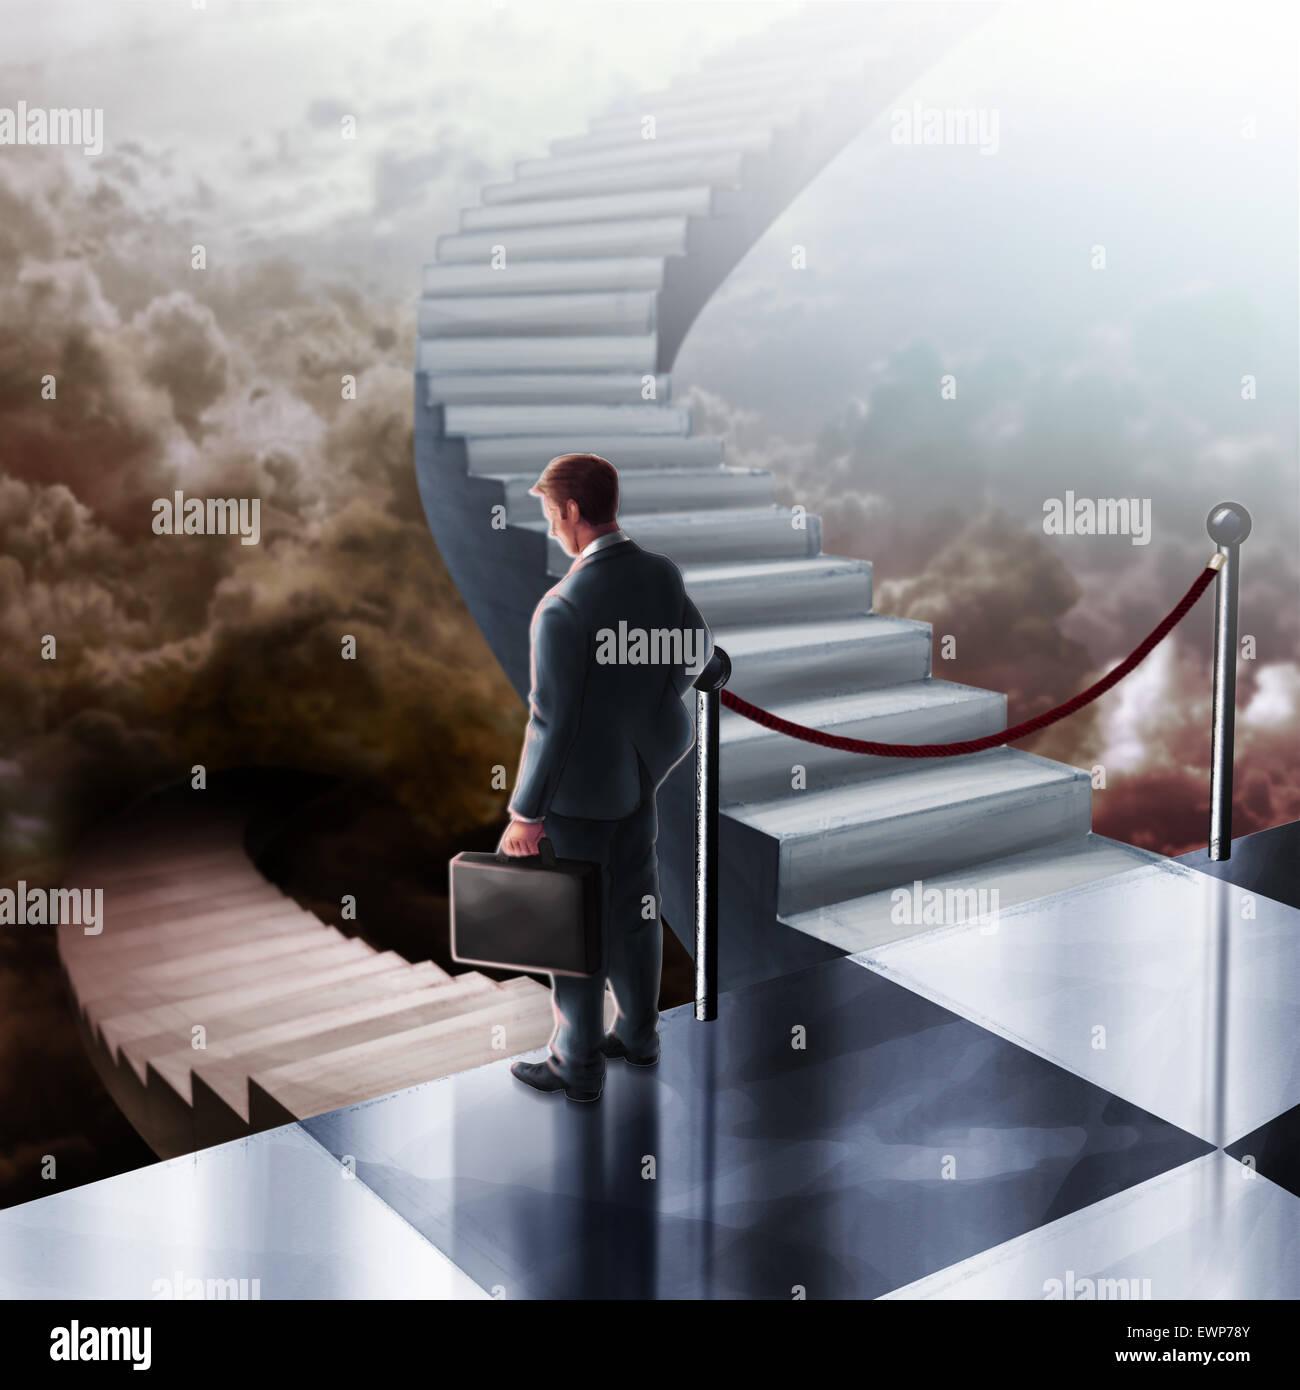 Illustrative image of sad businessman walking down staircase - Stock Image